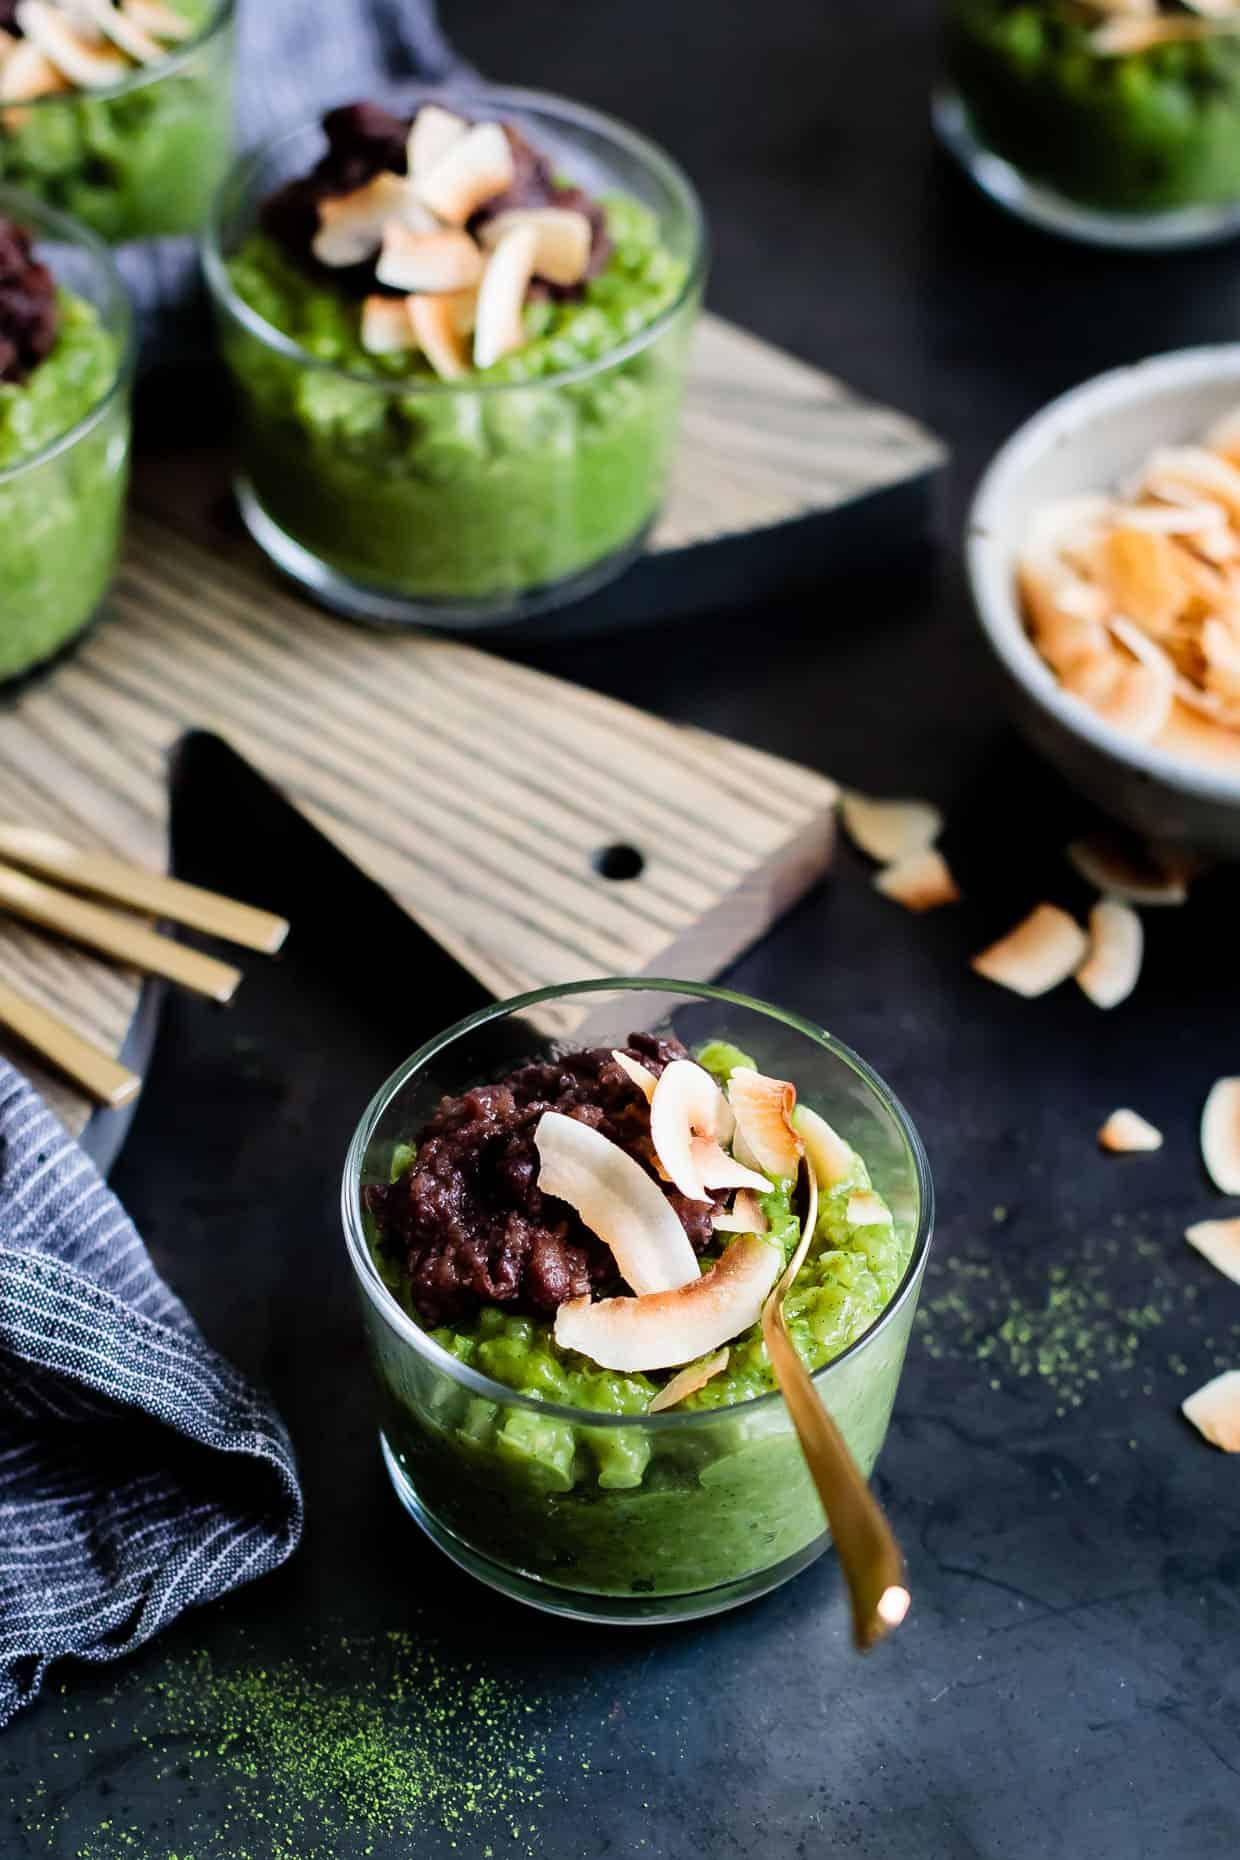 Coconut Matcha Rice Pudding with Date Adzuki Bean Paste {Vegan}